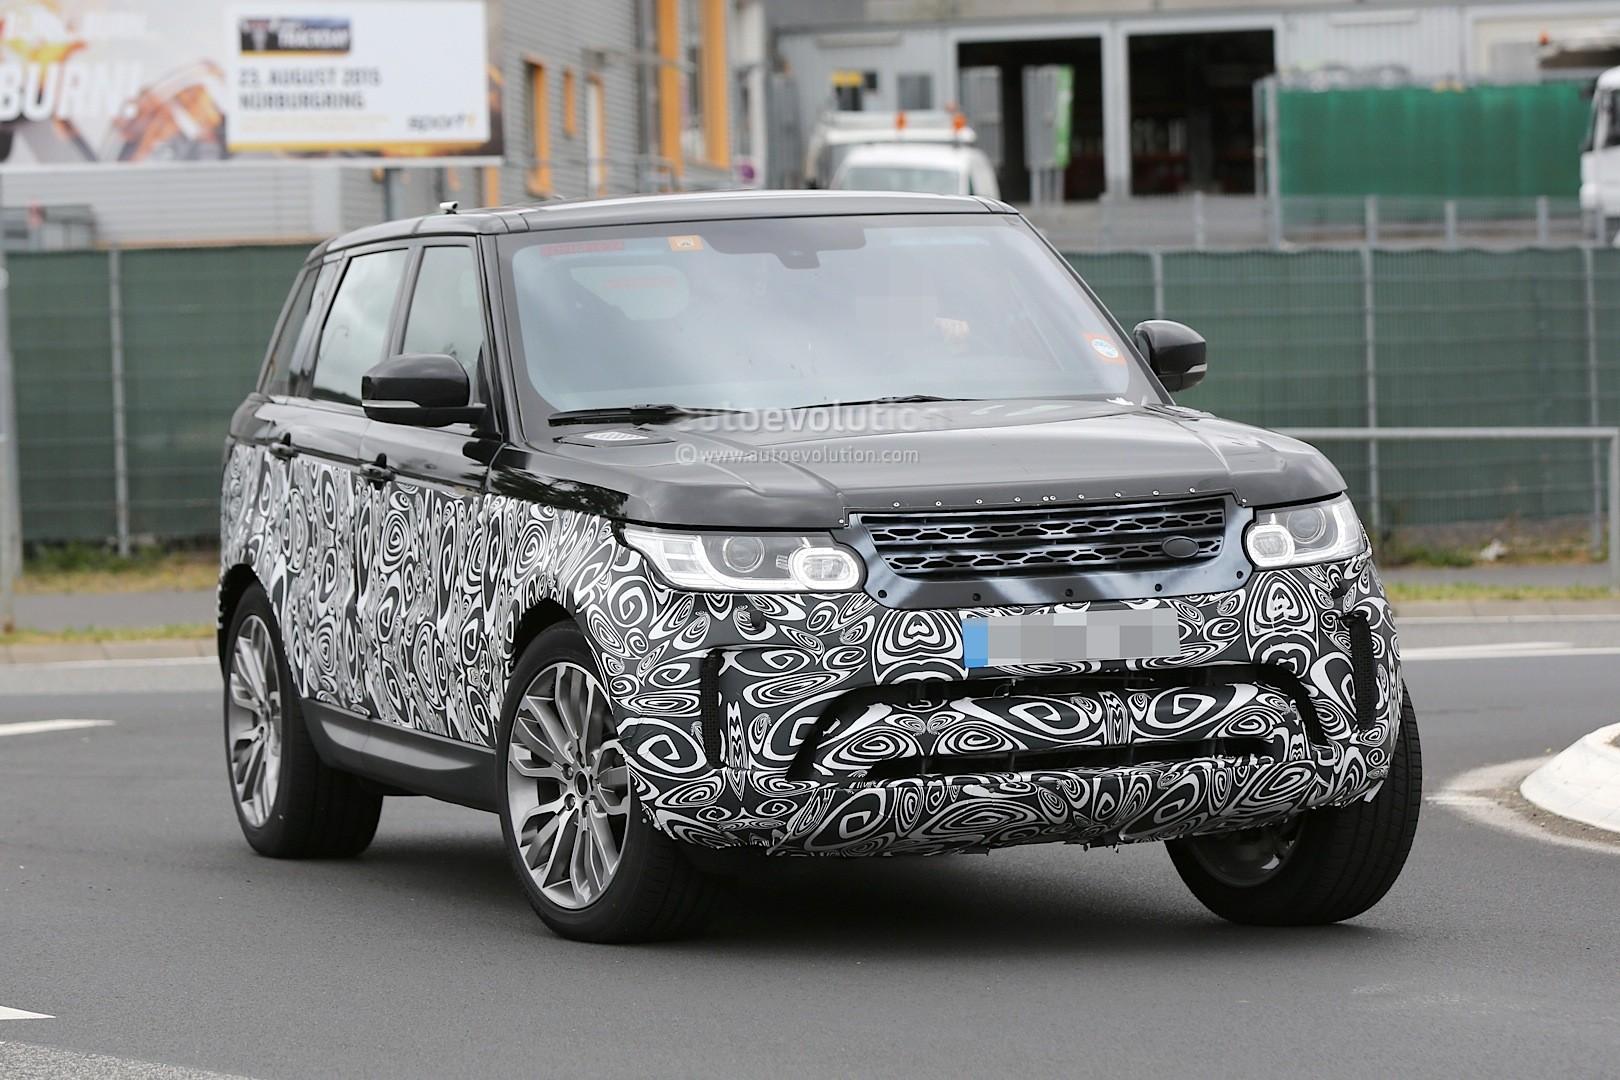 Spyshots: 2017 Range Rover Sport First Photos - autoevolution